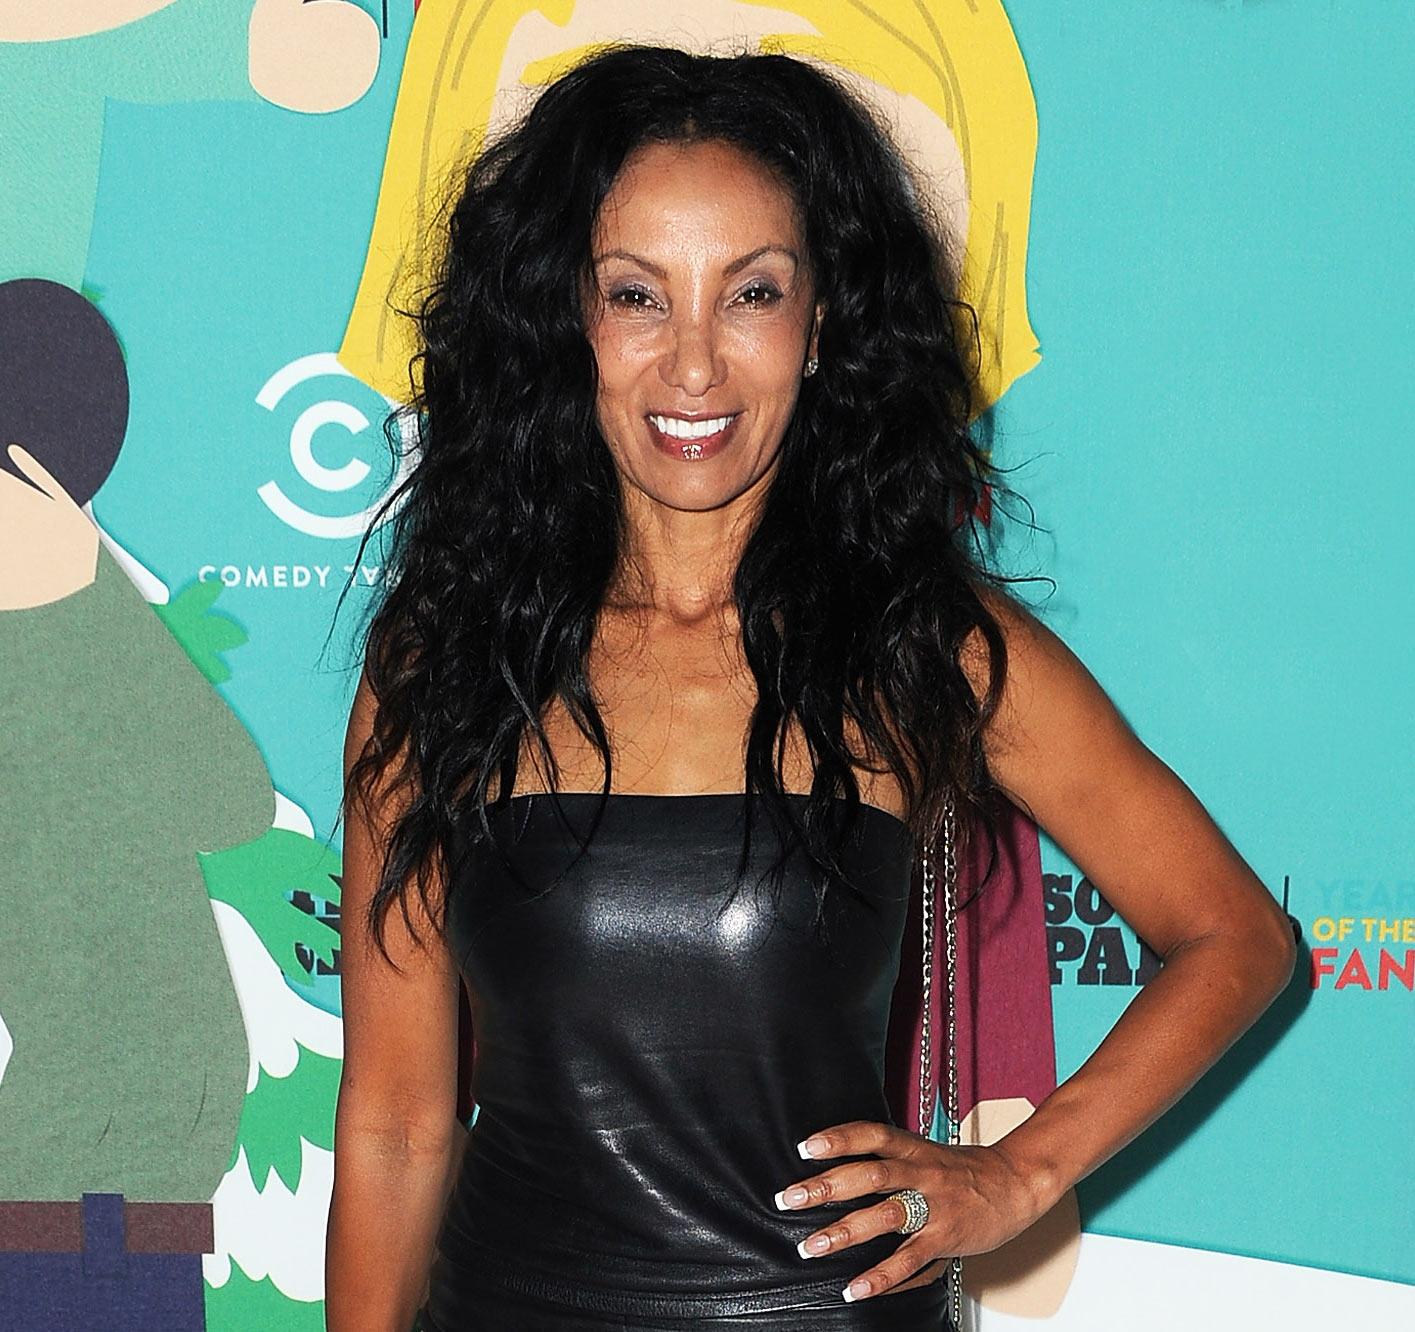 065889b1cef31 Downtown Julie Brown Details Prince's Early MTV Days: 'A Lovebug'